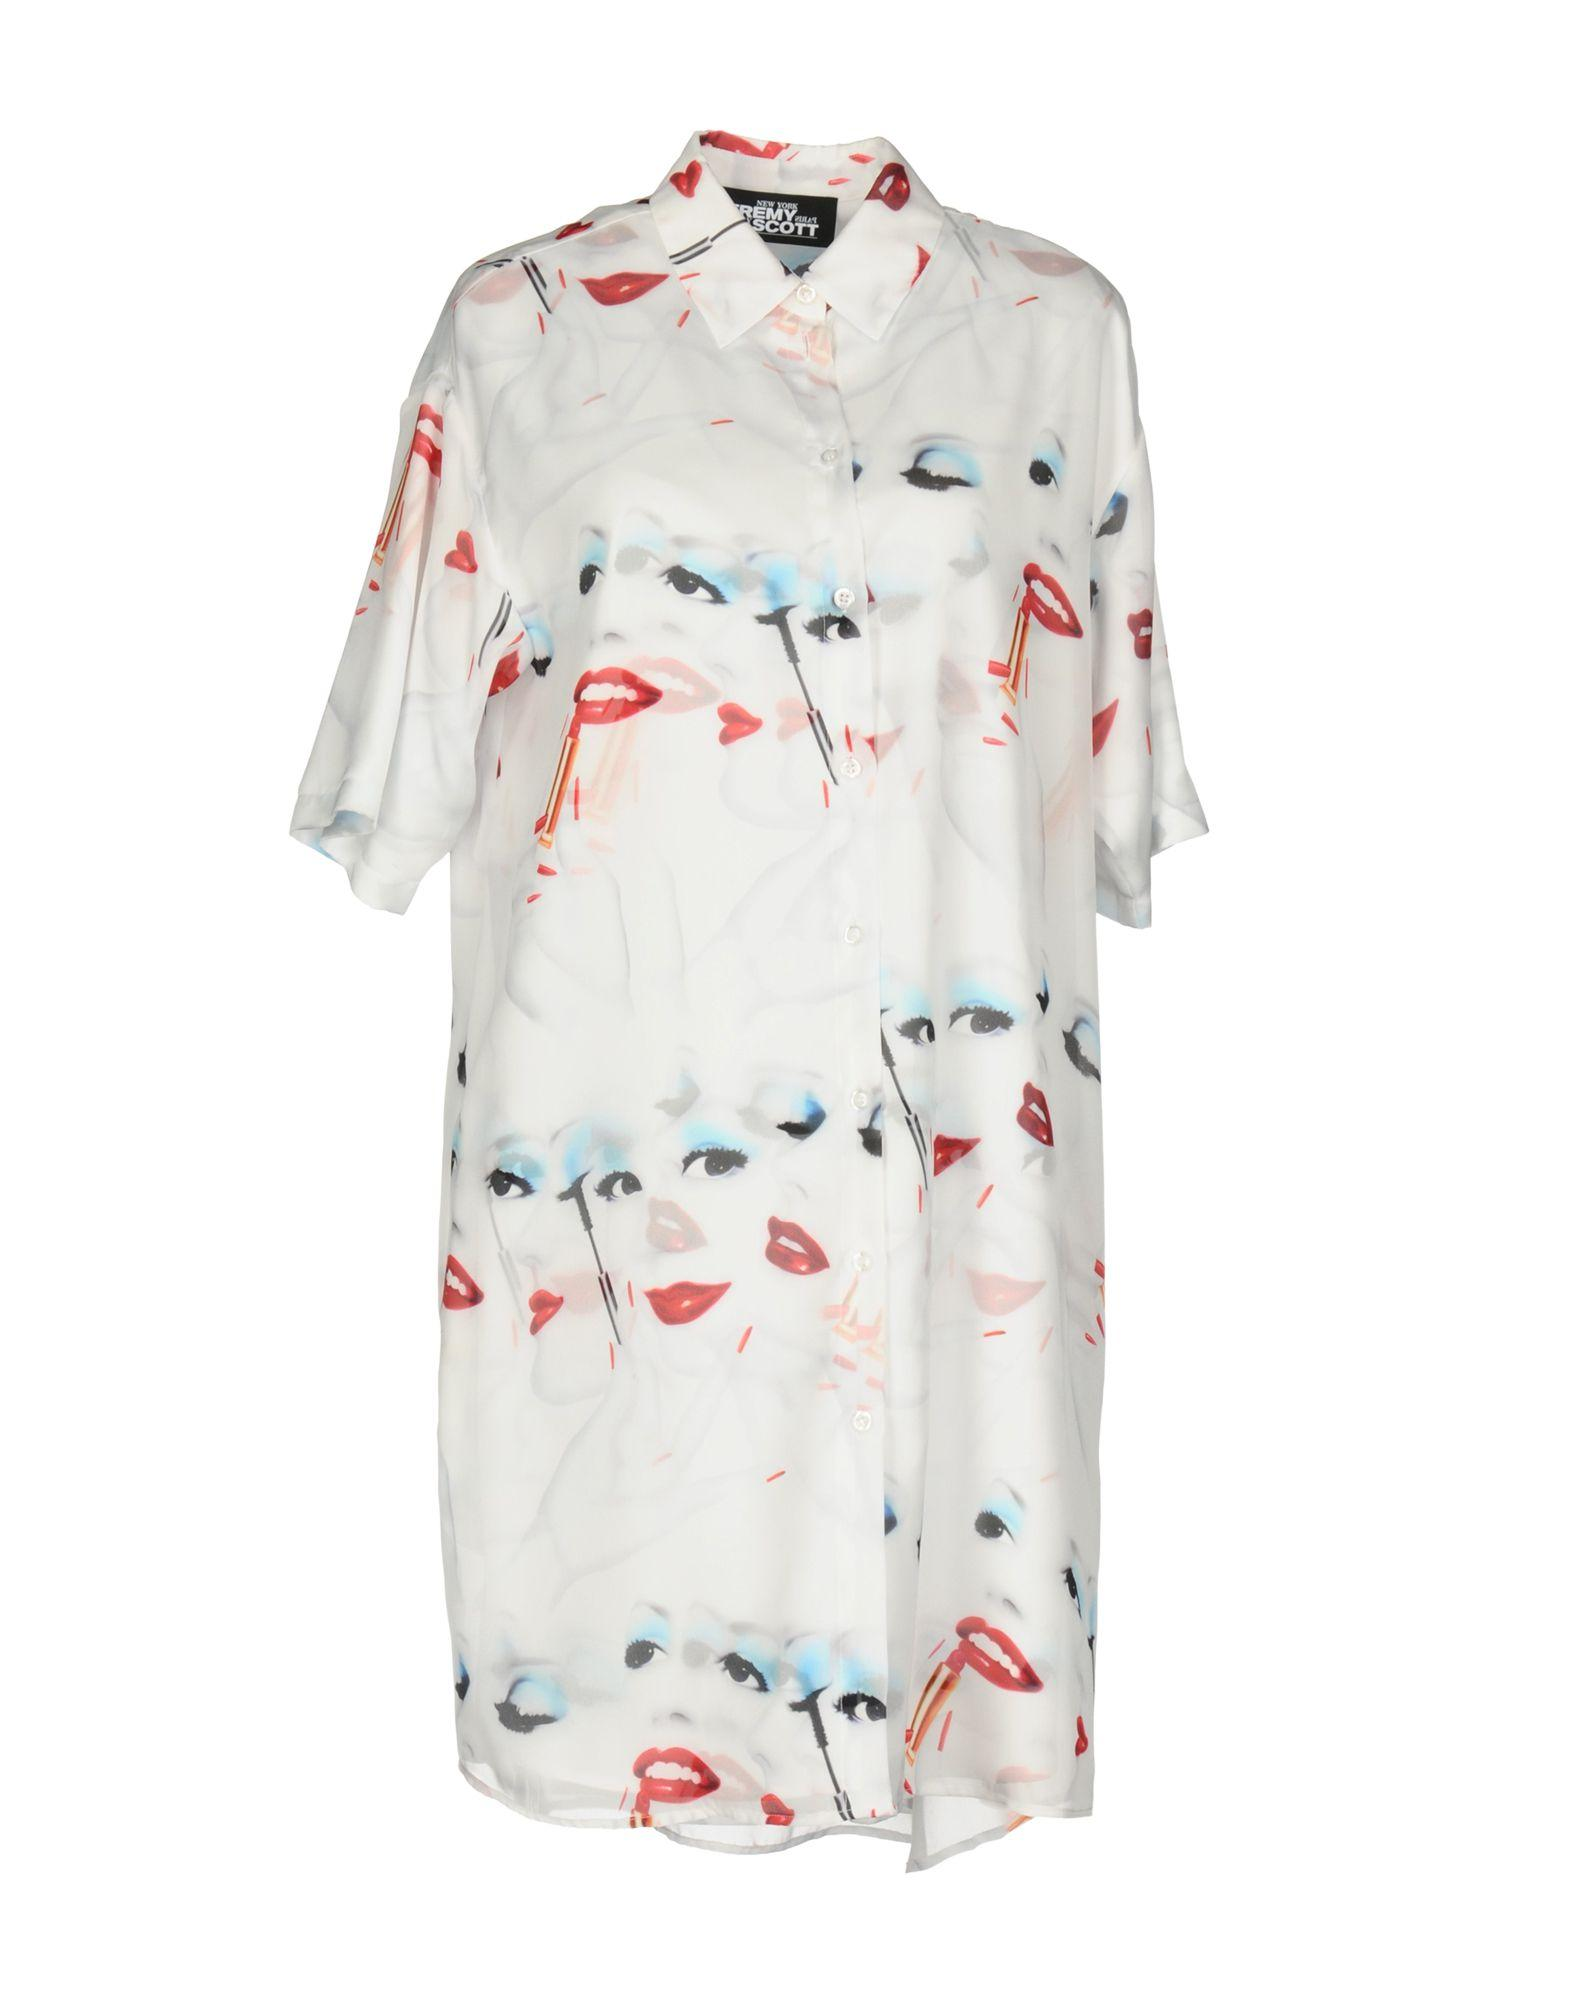 Jeremy Scott Shirt Dress In White